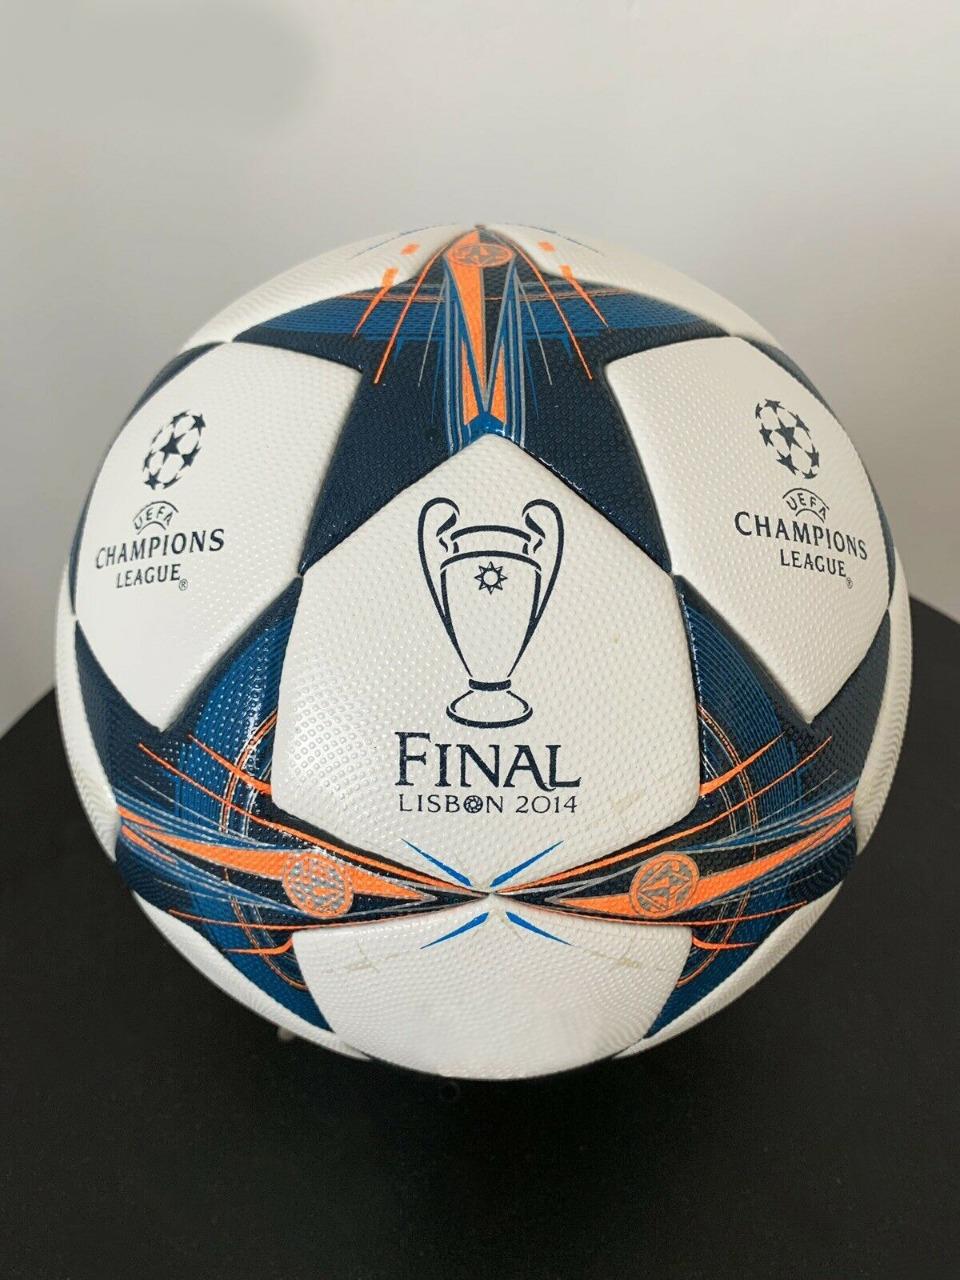 uefa champions league final lisbon 2014 thermal molded football pe 517 sports goods football play ego uefa champions league final lisbon 2014